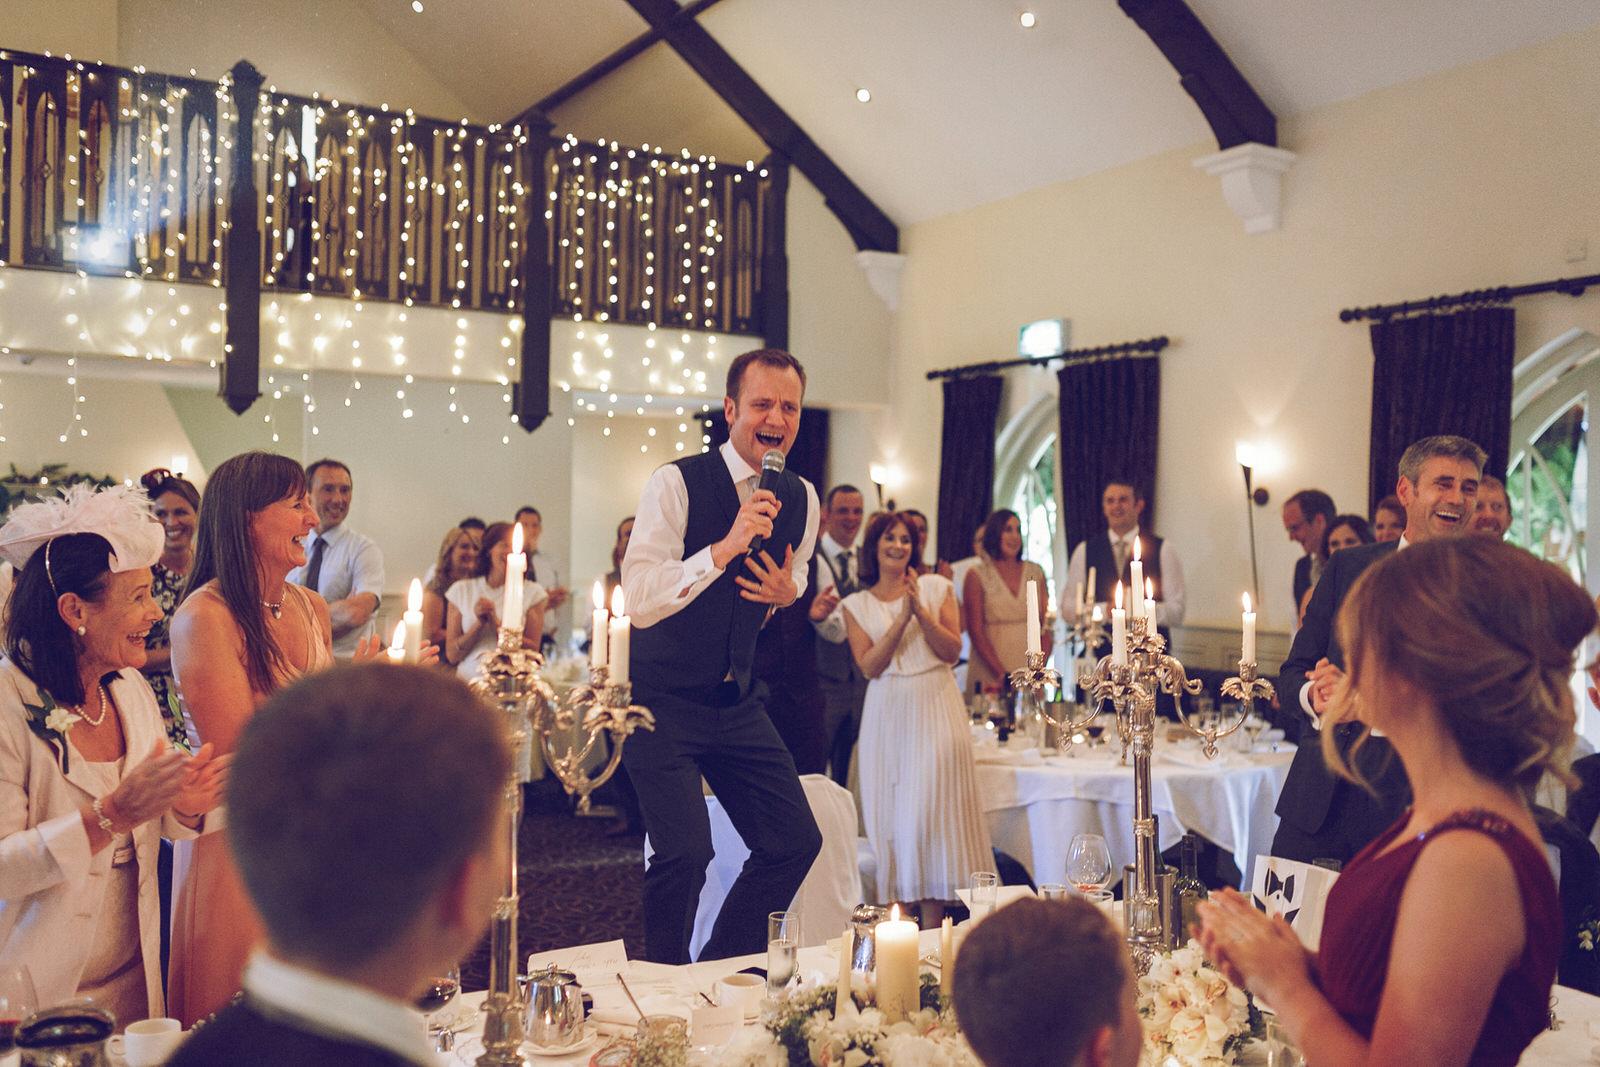 Brooklodge-wicklow-wedding-photographer_134.jpg